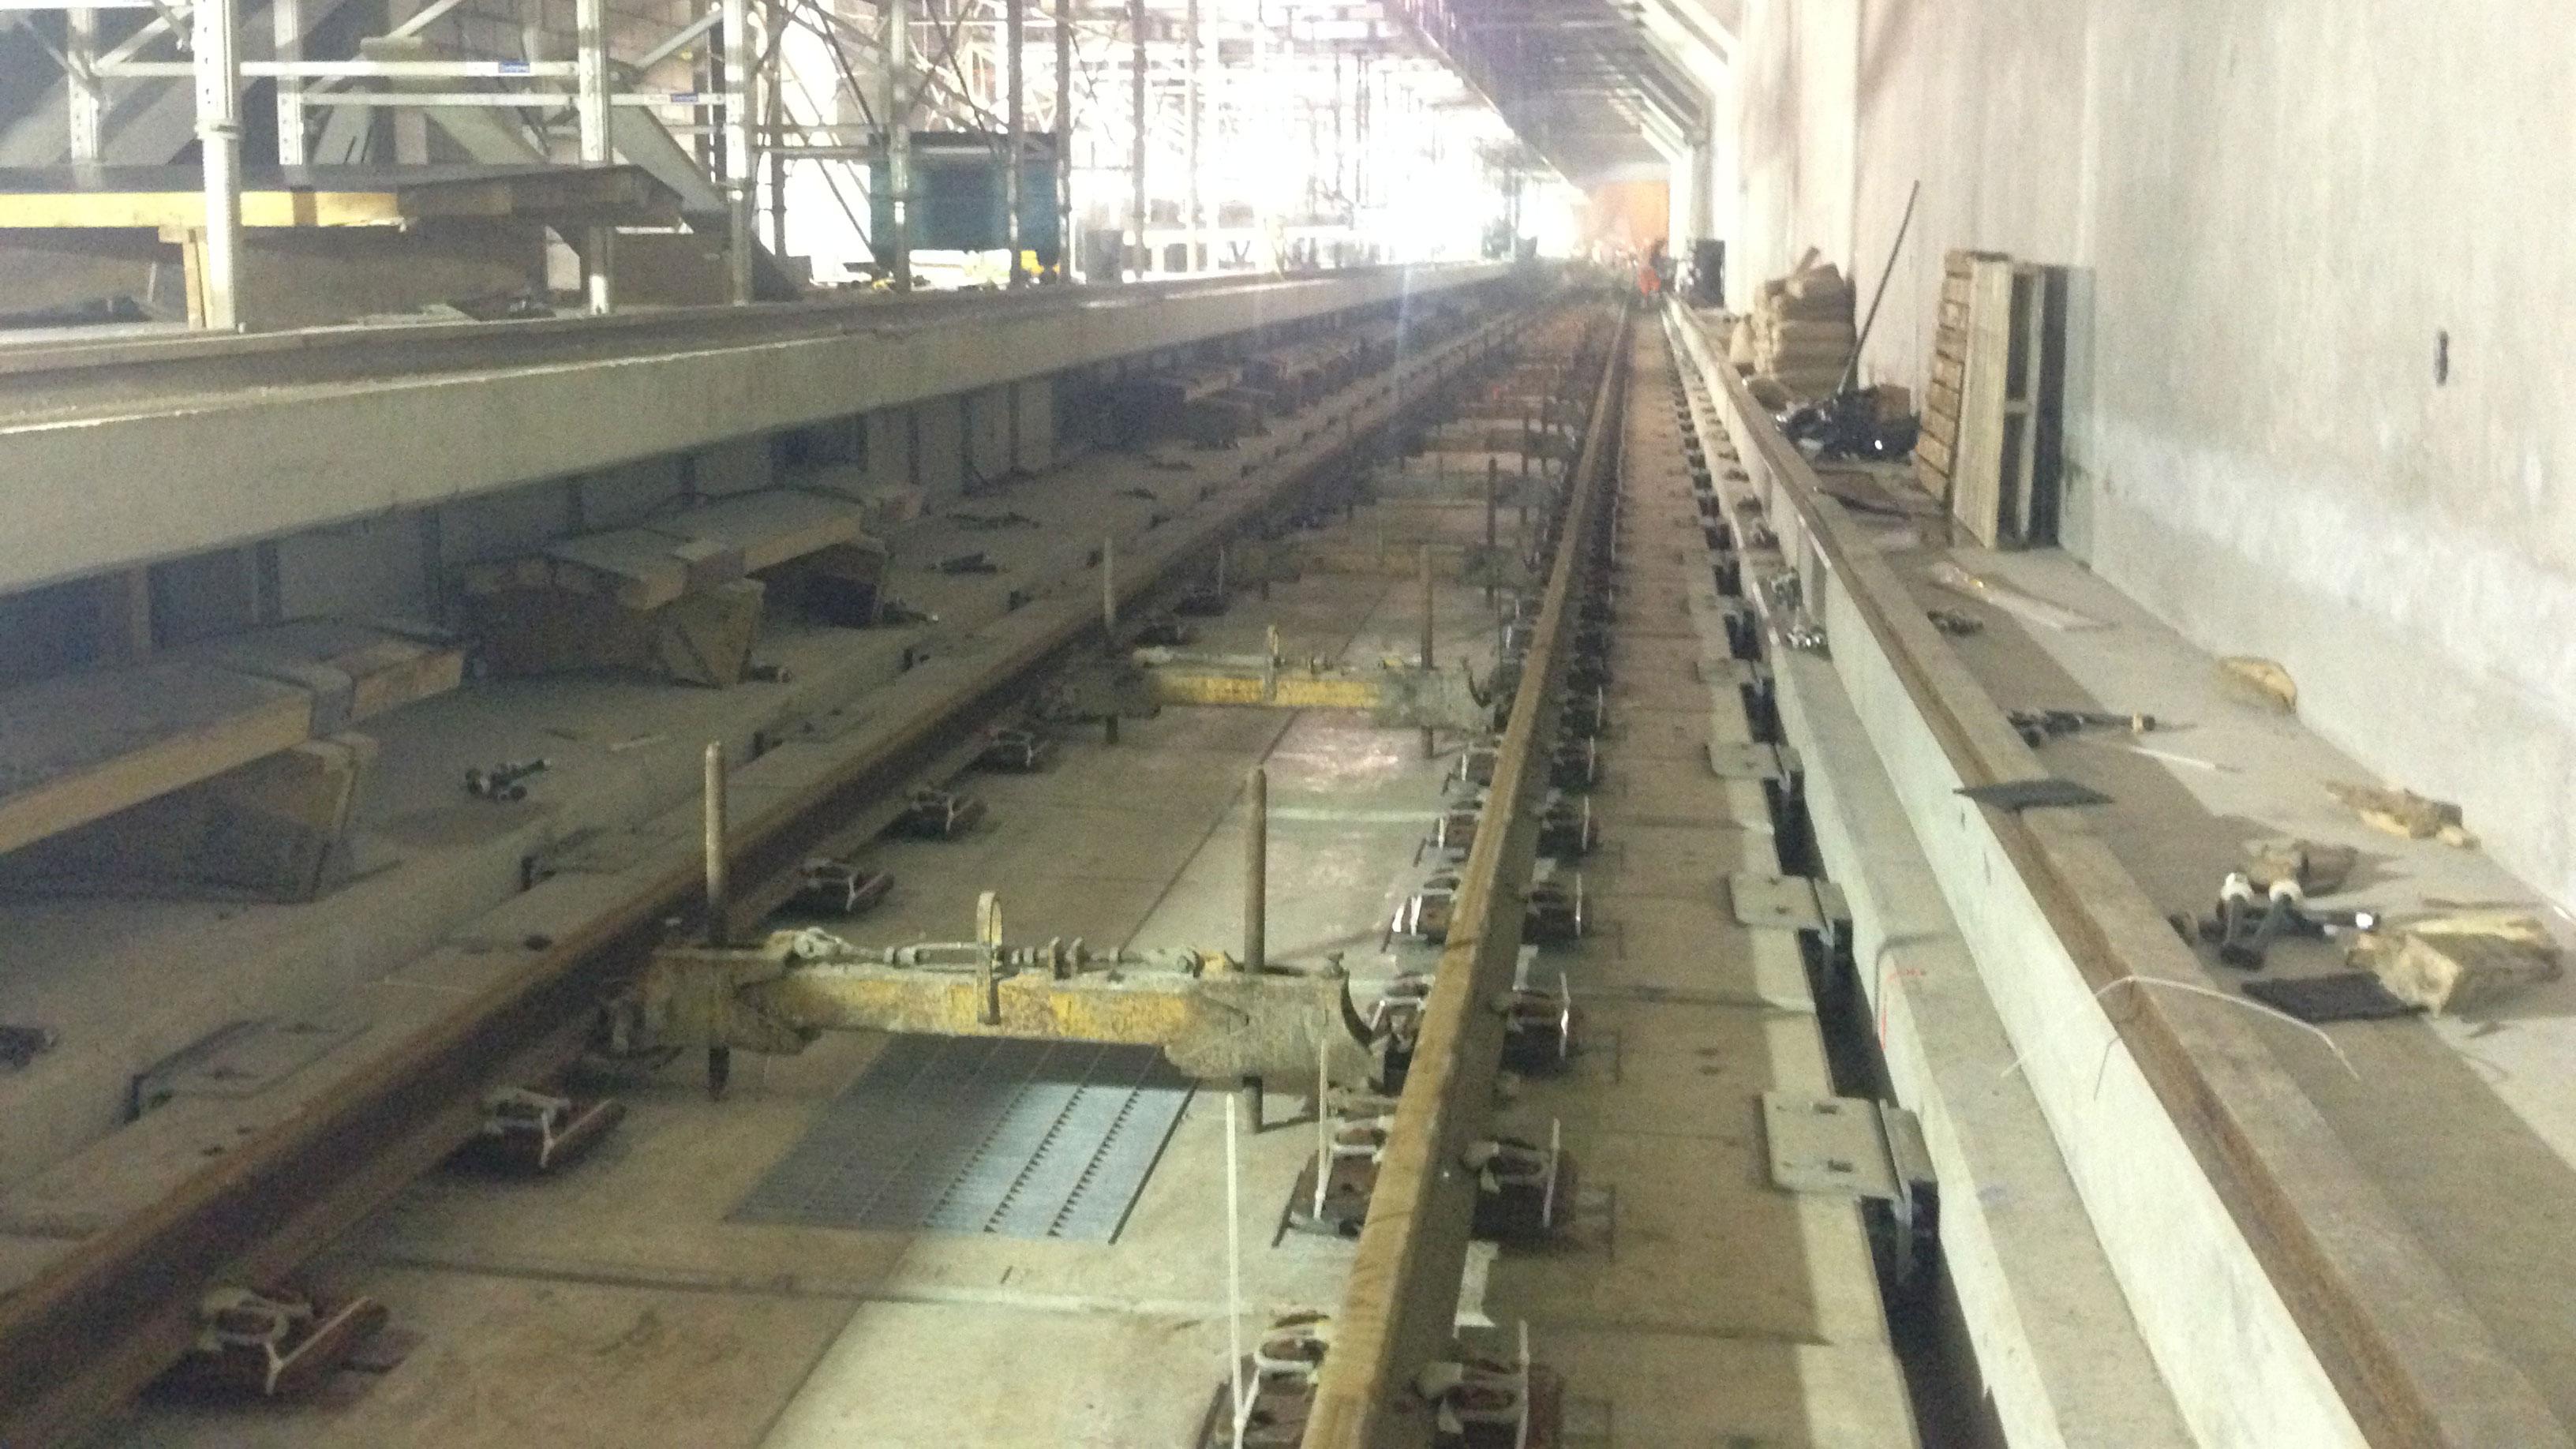 Construction on the Toronto-York Spadina subway extension on Jan. 15, 2016. CITYNEWS/Audra Brown.